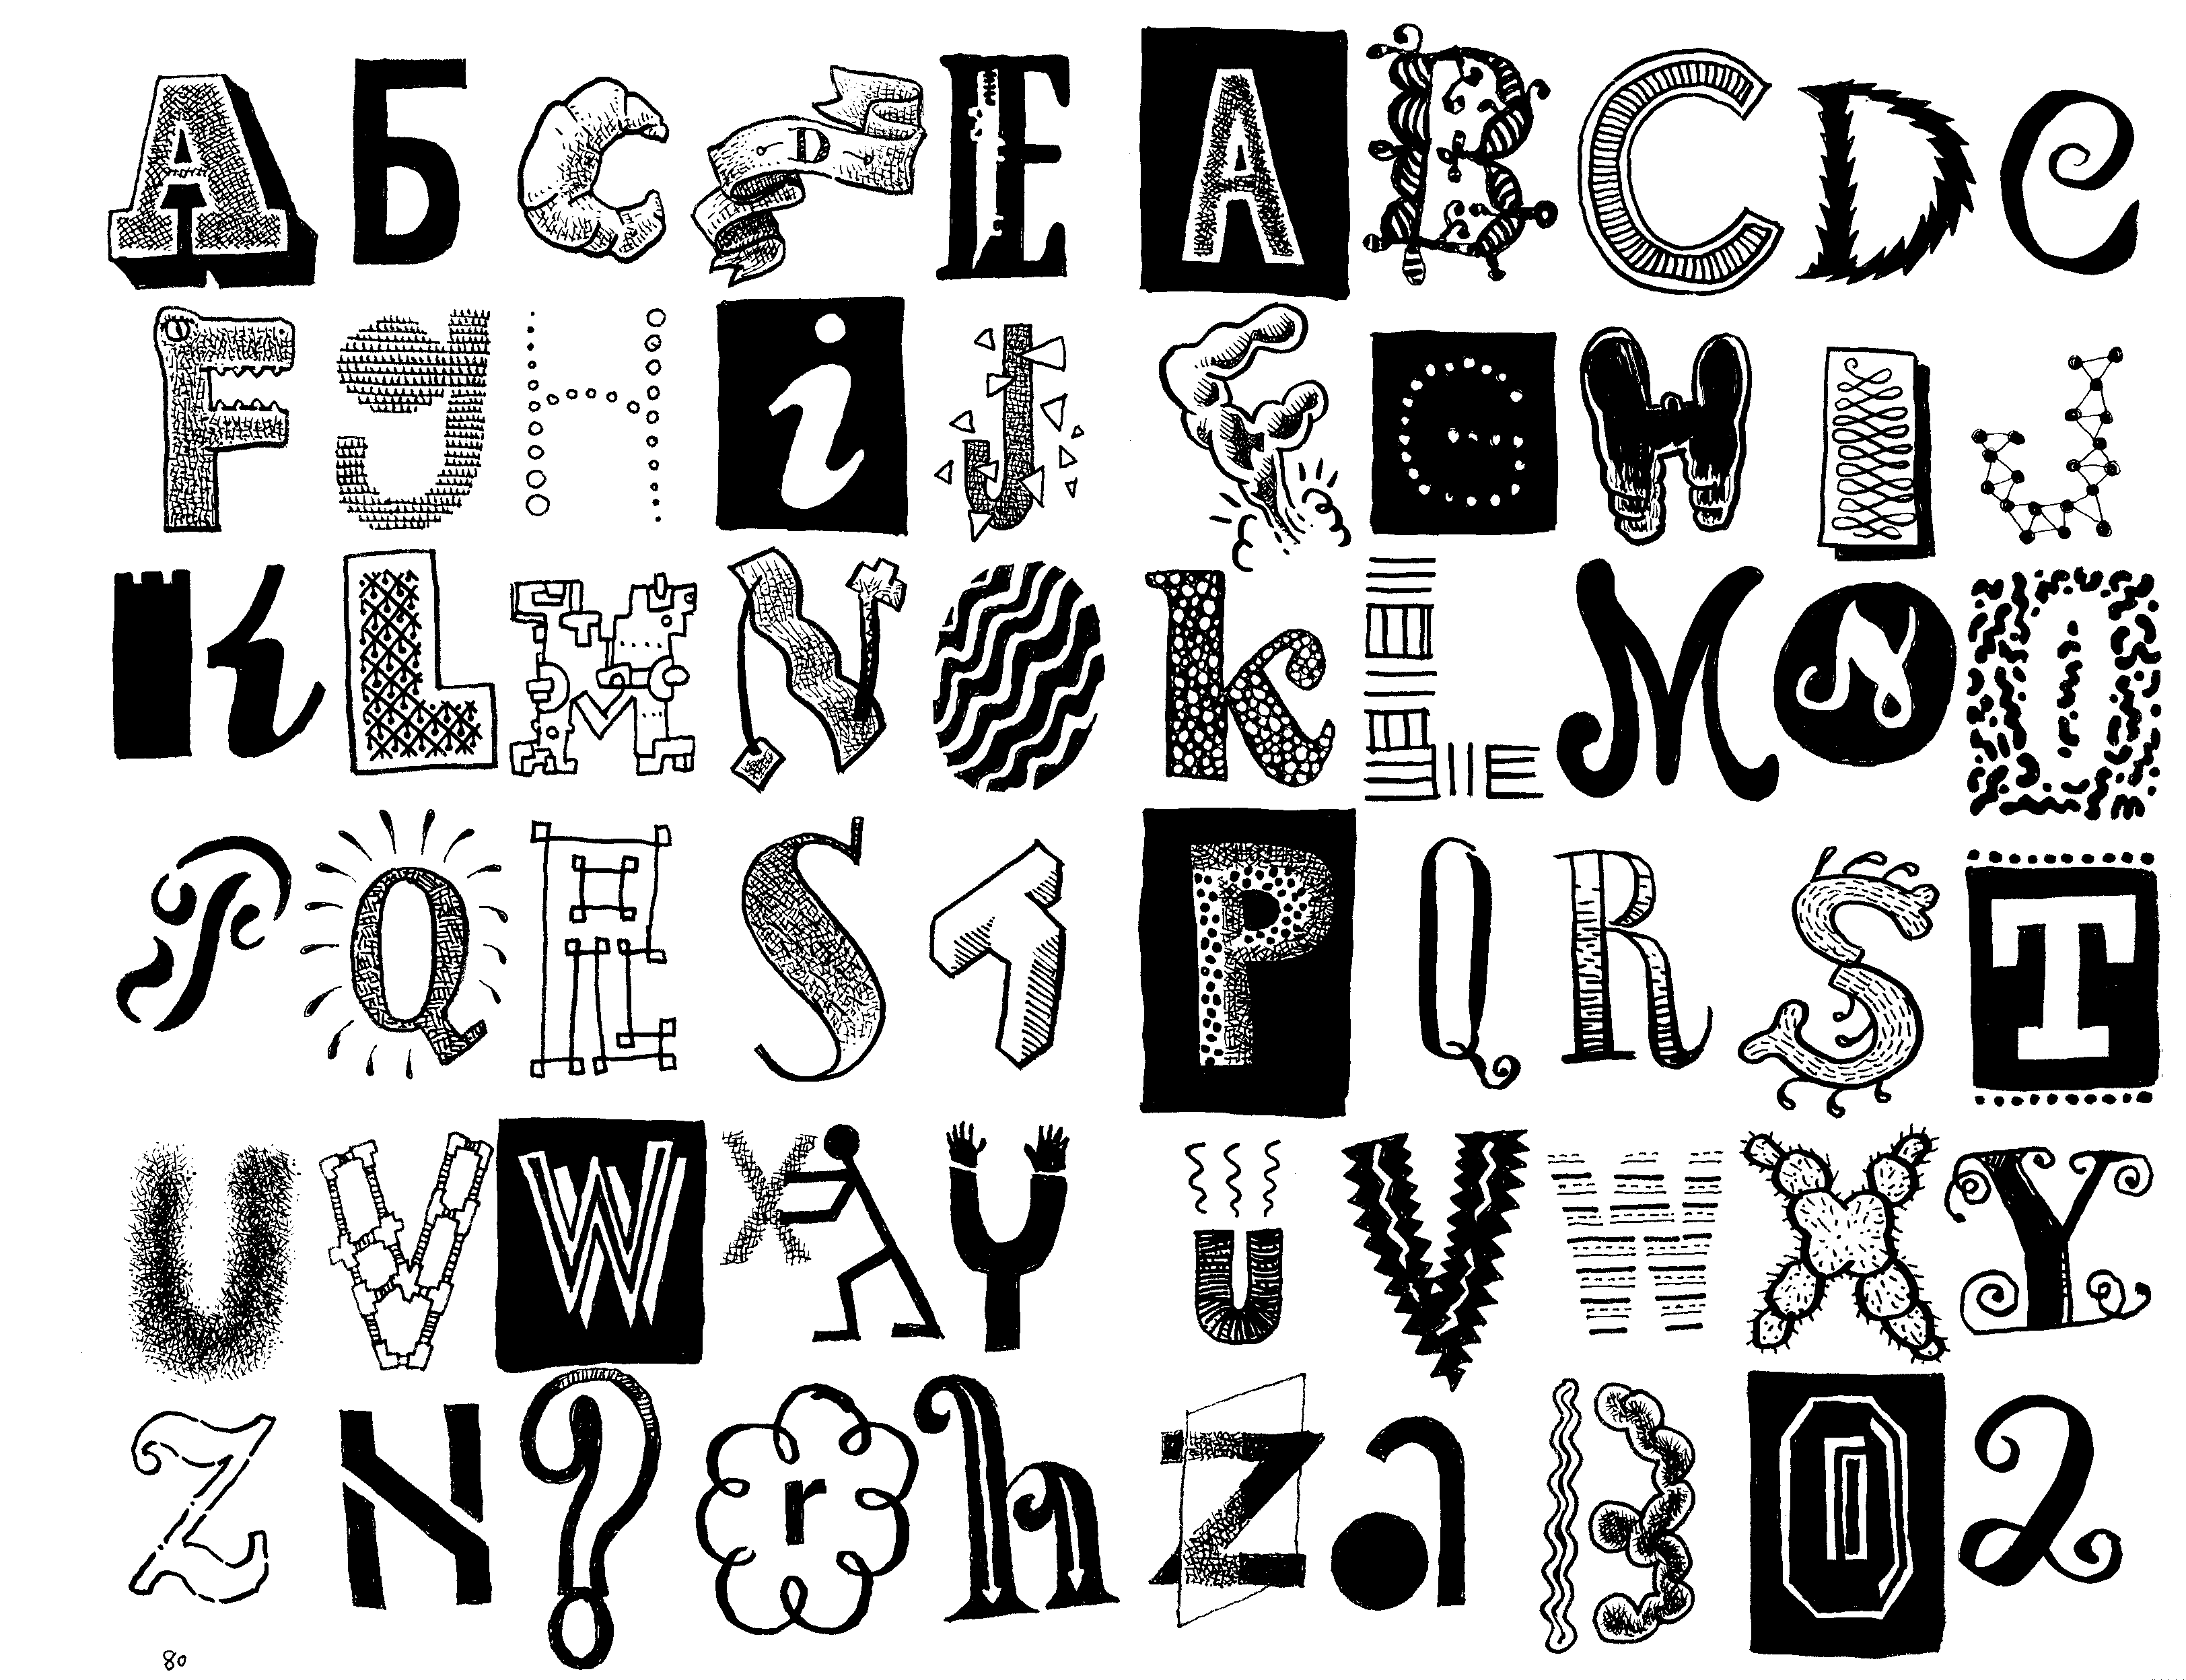 Cool Alphabet Letters To Copy And Paste Letter doodles (set)